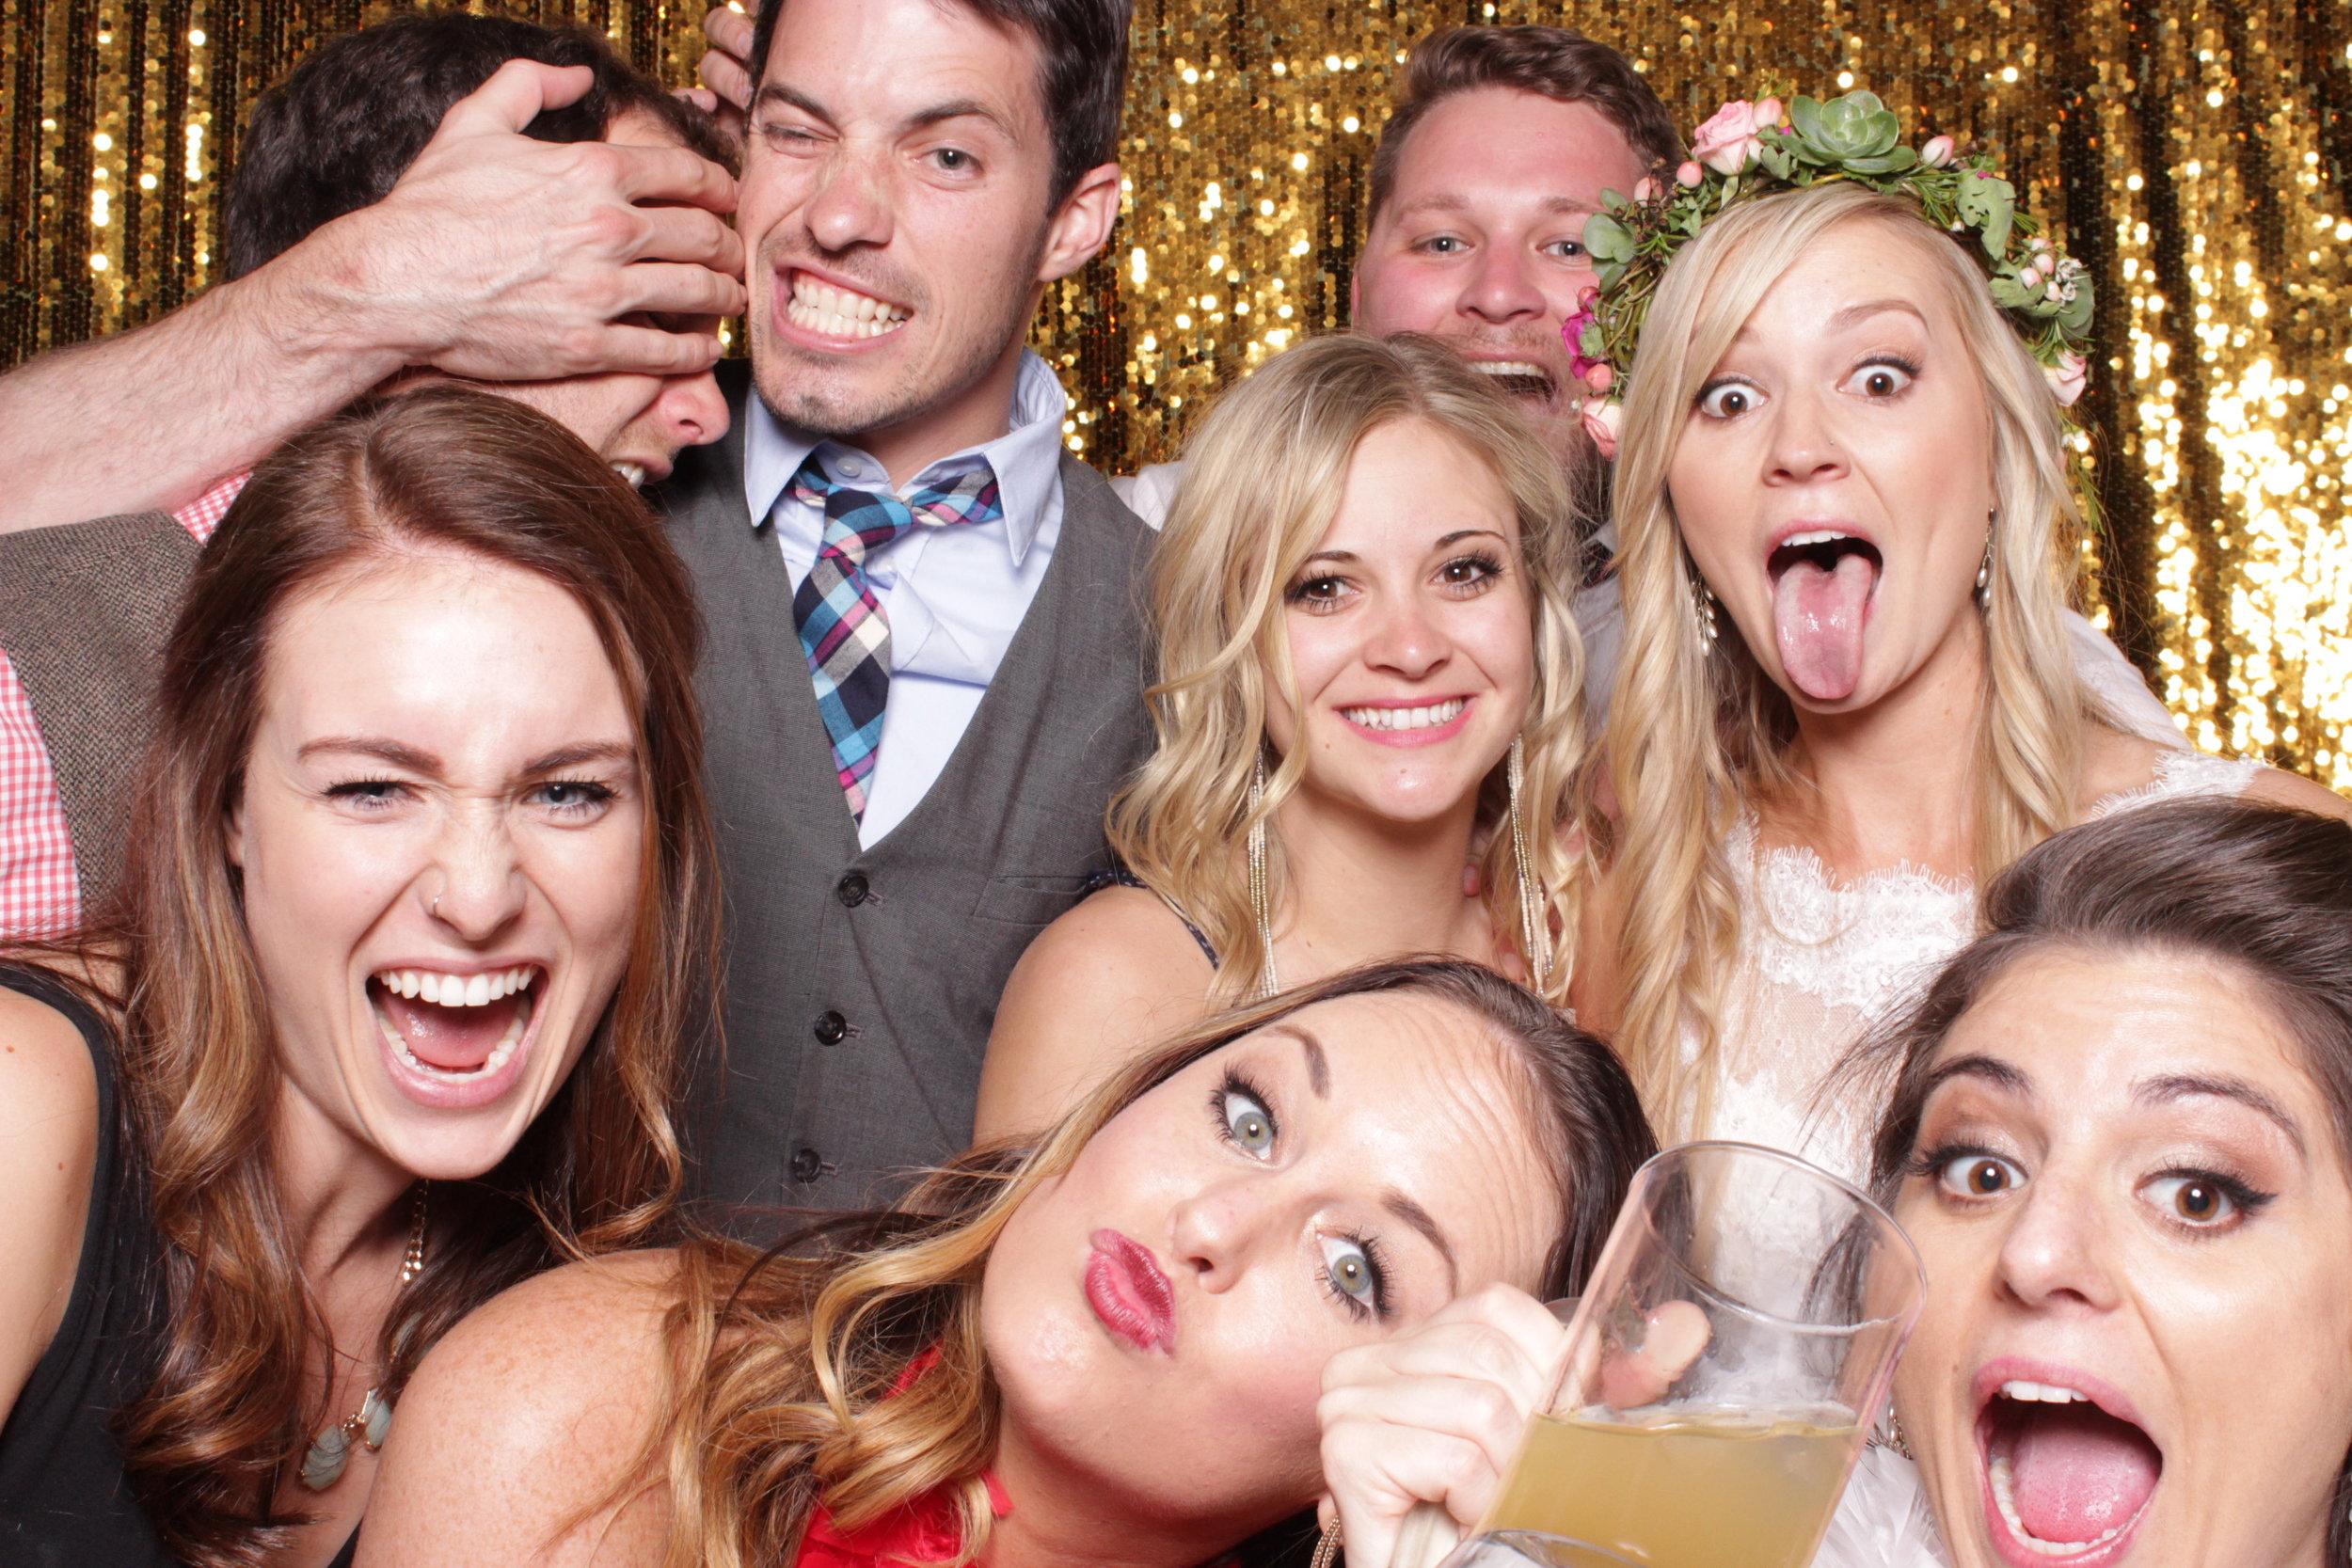 chico-wedding-photo-booth-rental-reception-friends